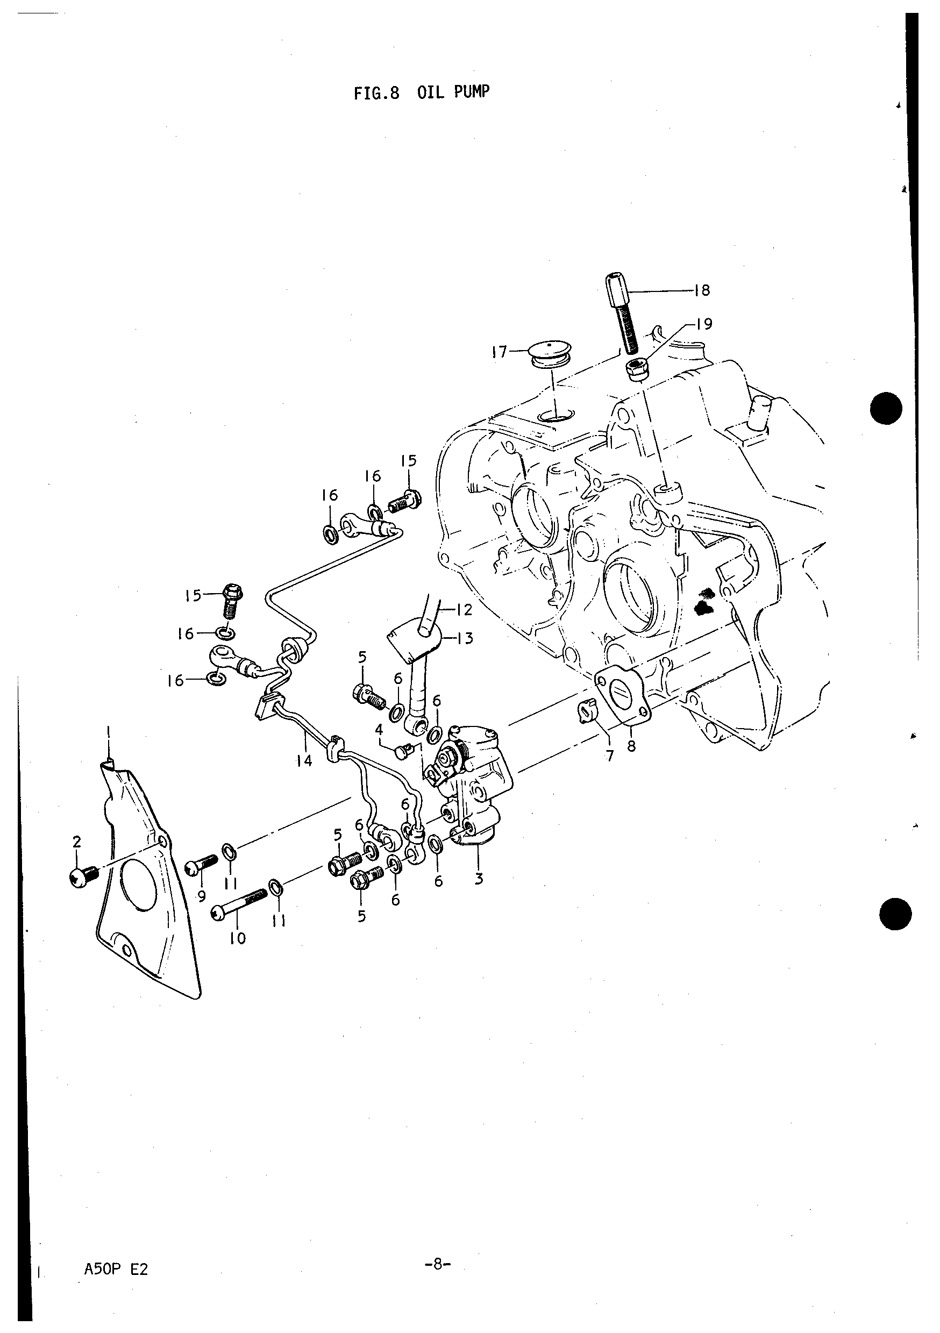 Genuine Suzuki A50P (AP50) Oil Pump Union Bolt Hole Cap